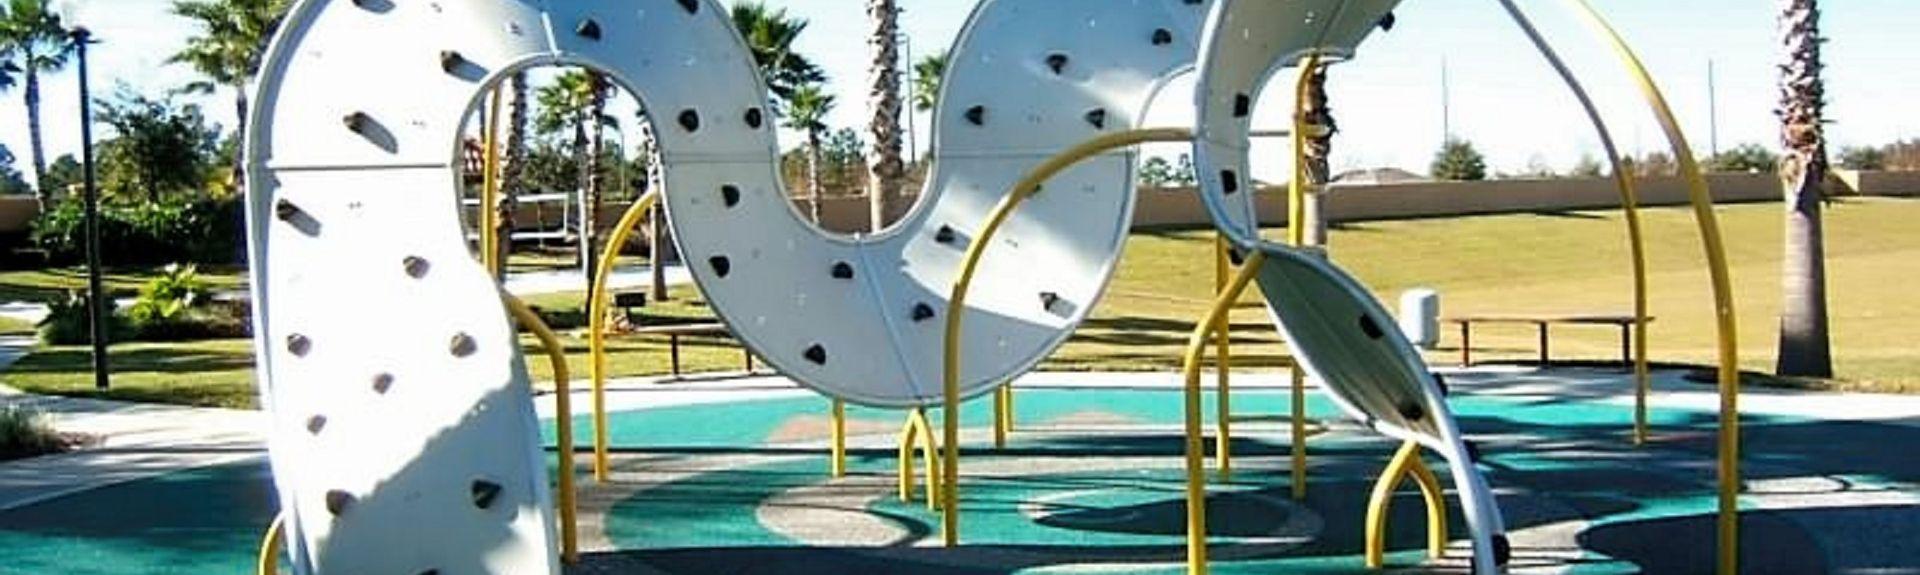 Calabay Parc, Davenport, Florida, United States of America